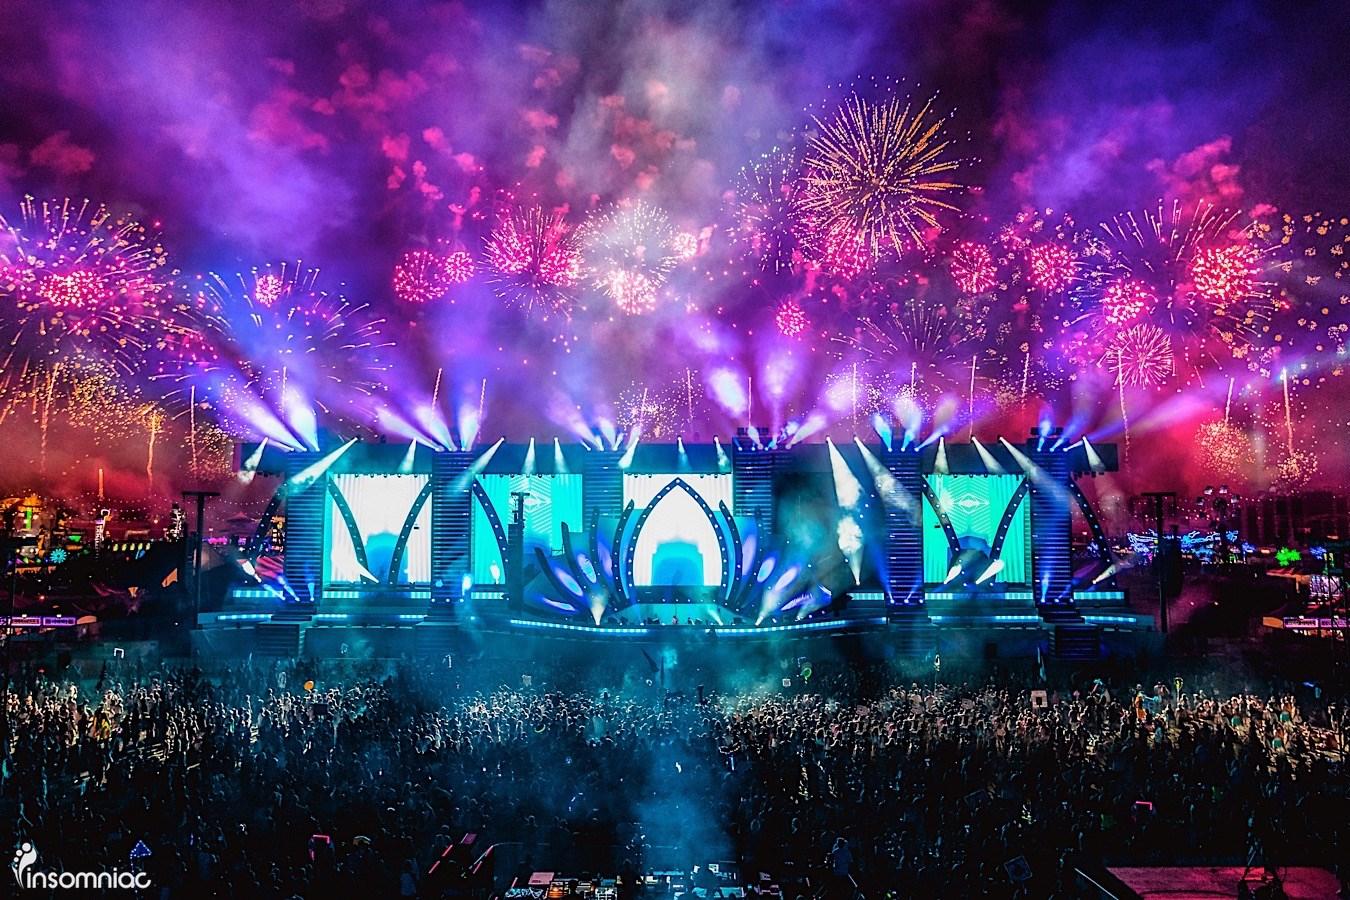 Insomniac Officially Announces EDC Las Vegas 2017 Lineup